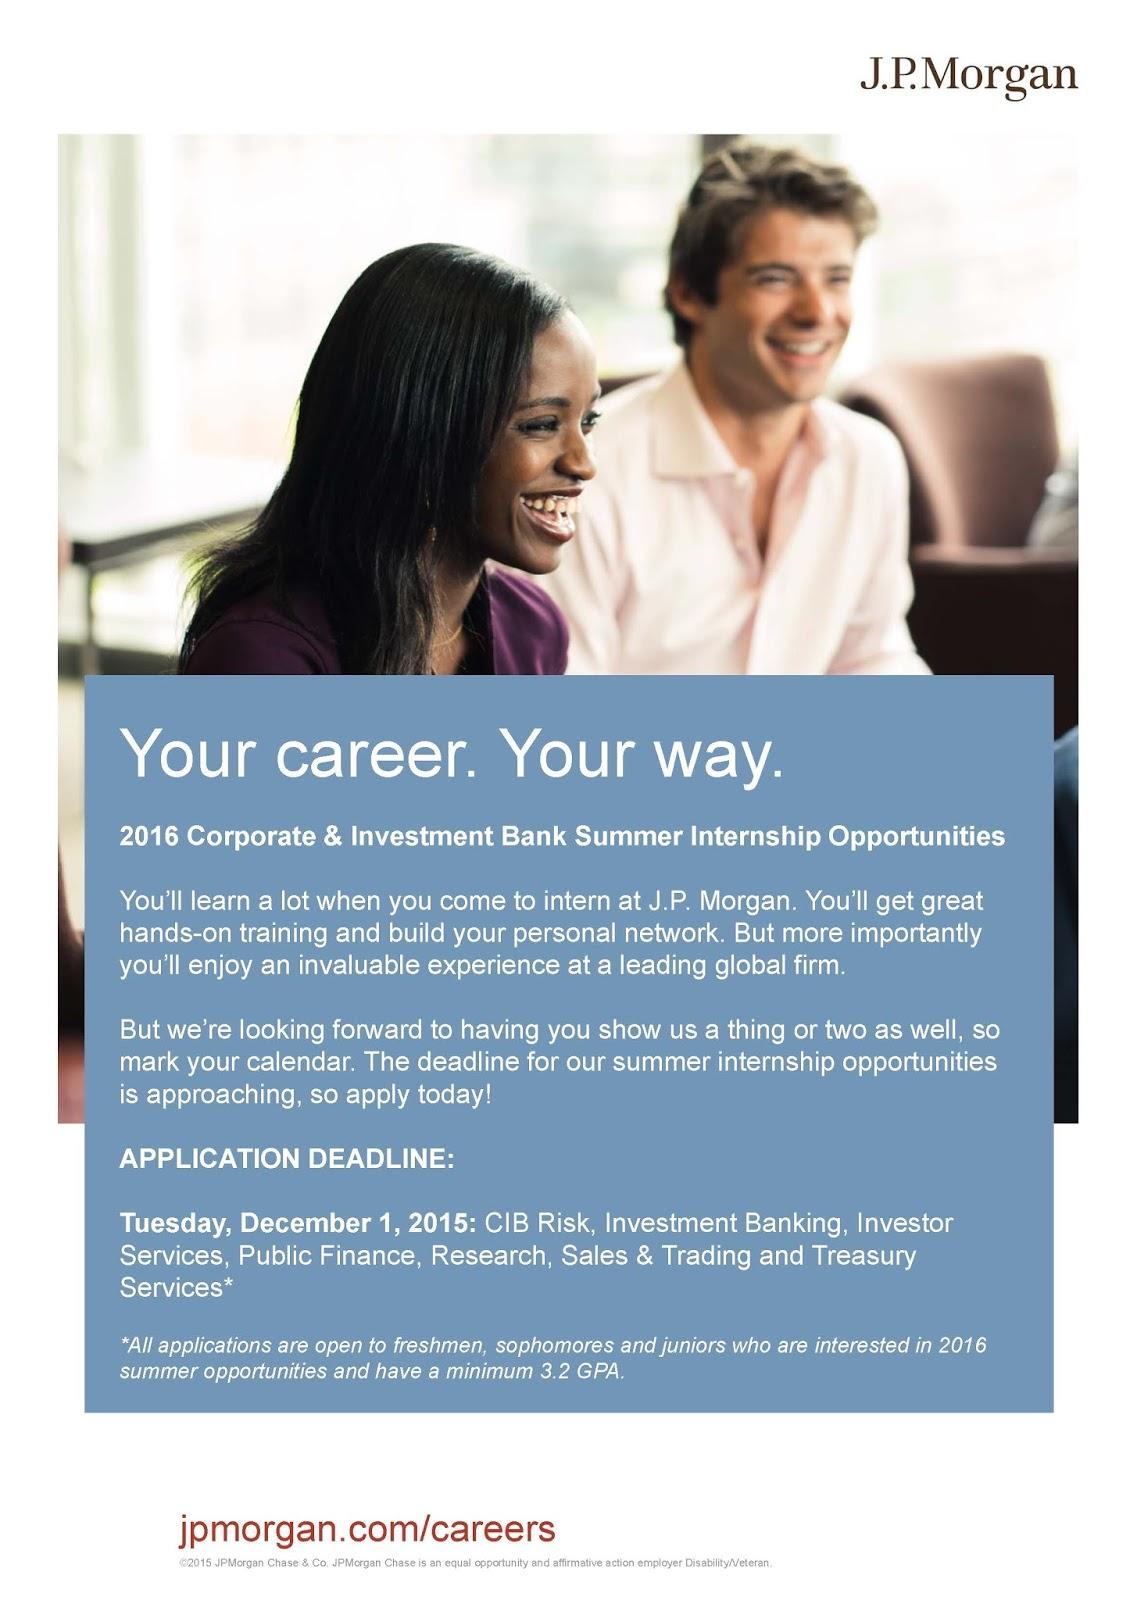 ECON Undergraduate Blog: 2016 Summer Internship Opportunities with